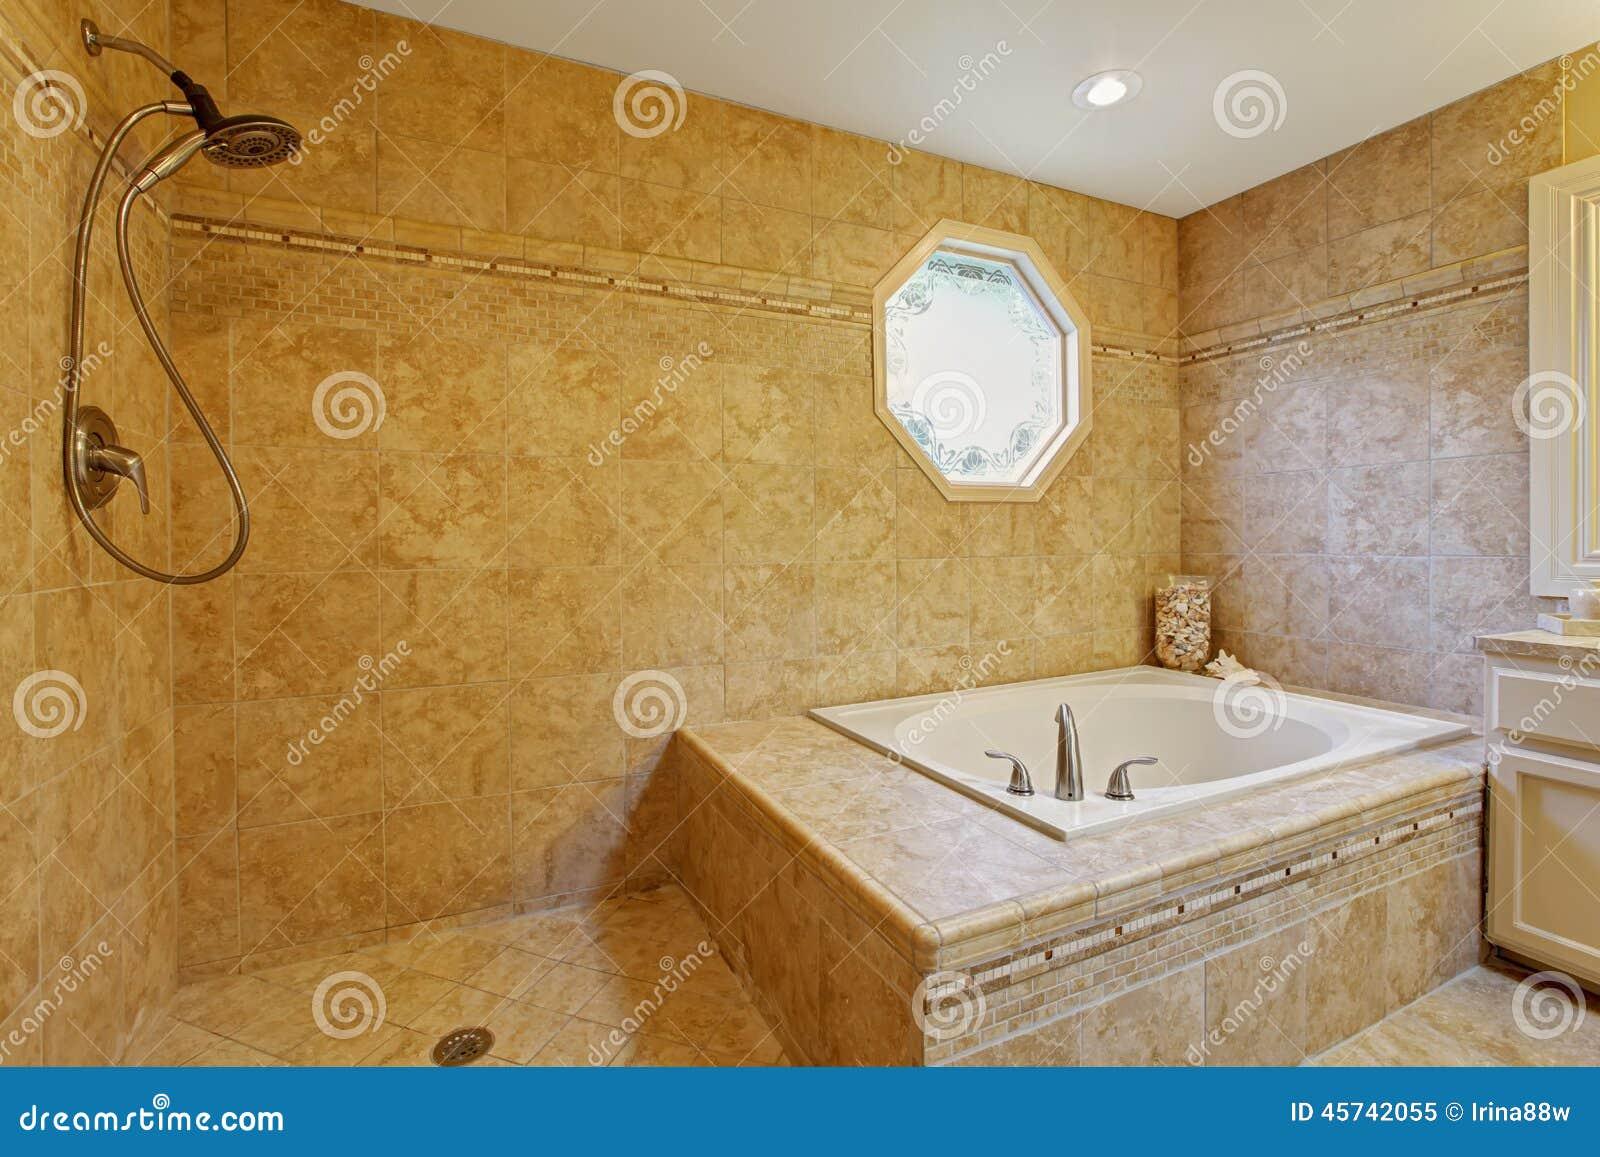 Luxury Bathroom Interior With Tile Trim Stock Image - Image of ...